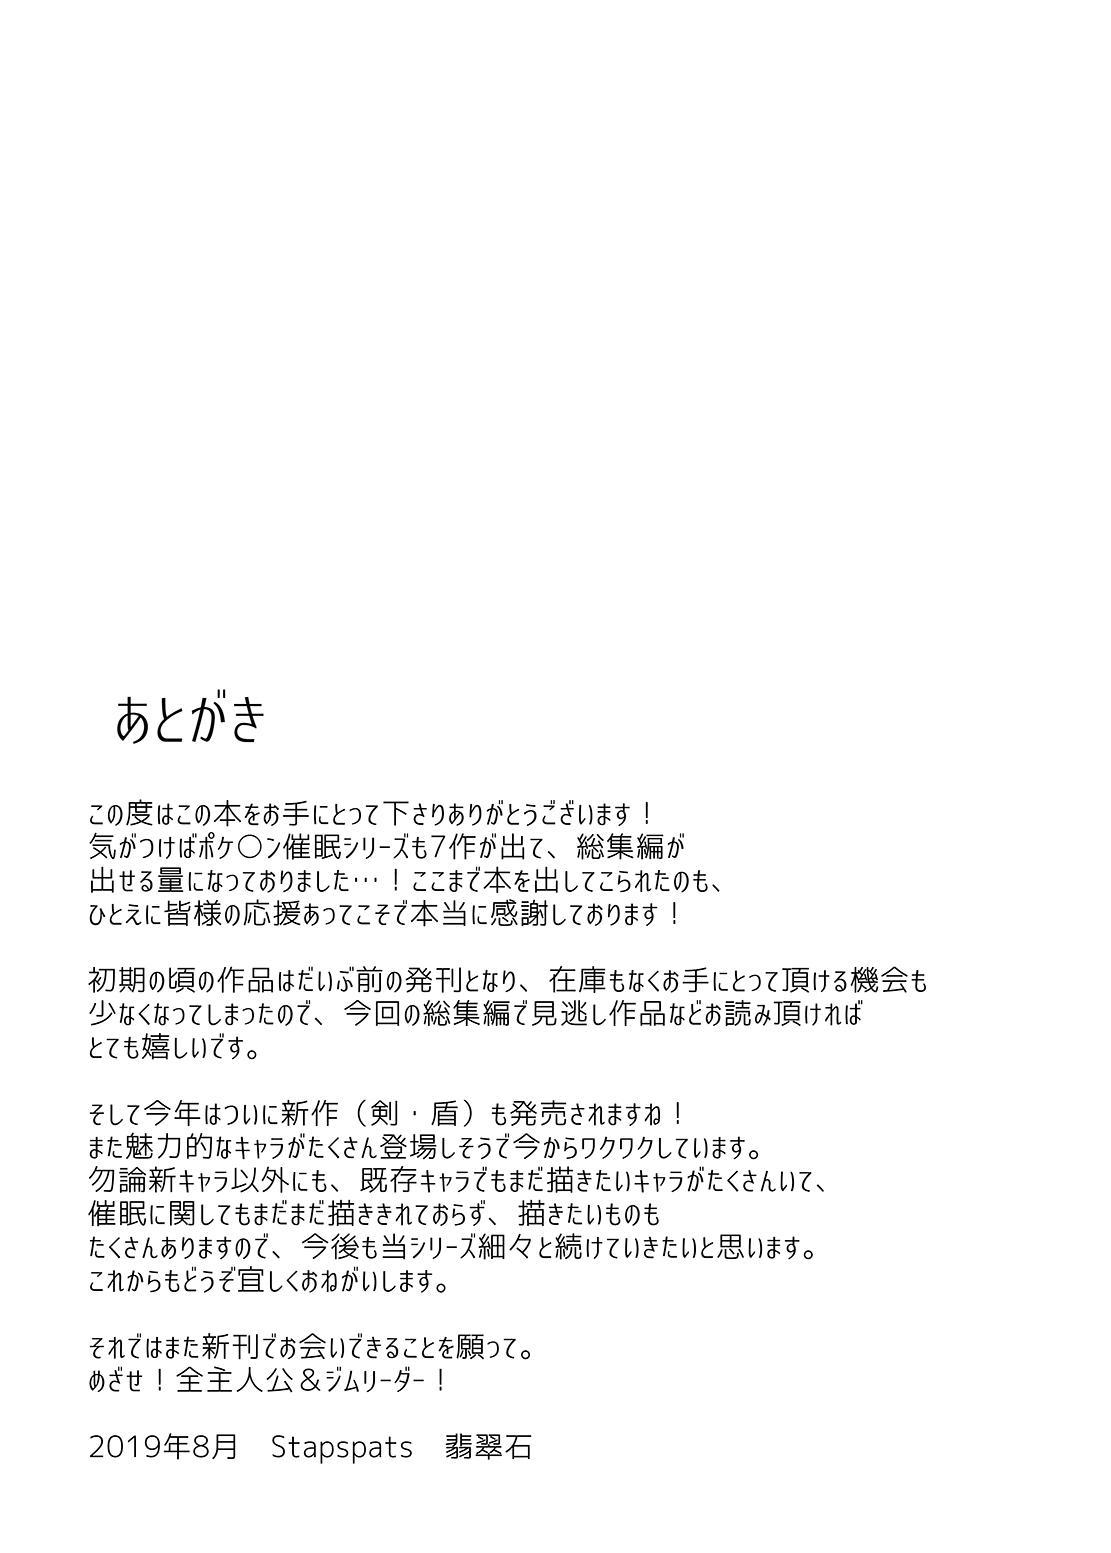 [Stapspats (Hisui)] Stapspats [Pocket Monster Saimin Series Soushuuhen] 1 Collective Hypnosis (Pokémon) [Digital] 129